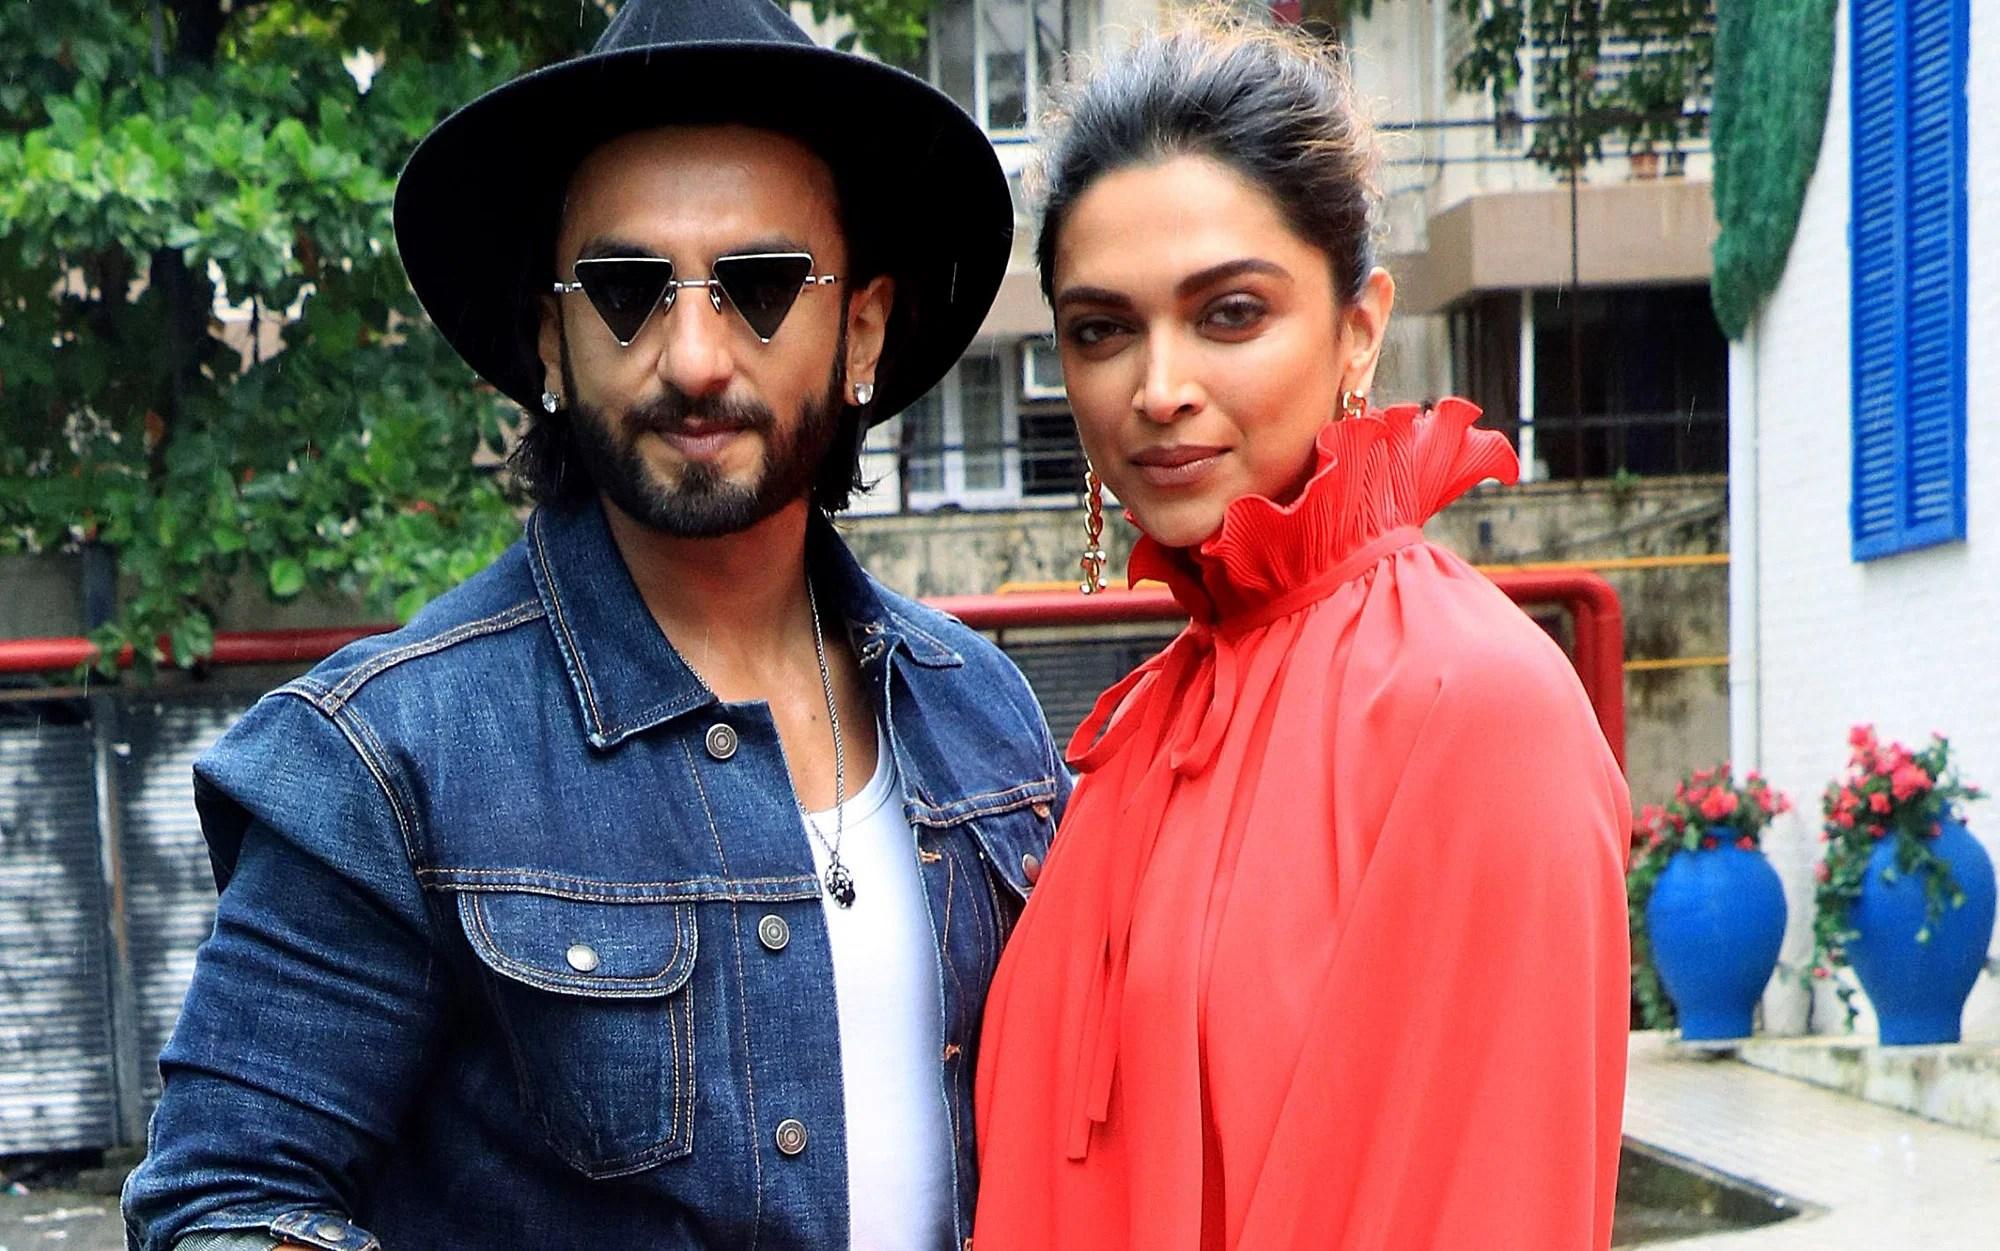 Deepika Padukone and Ranveer Singh buy property in Alibaug; duo spotted at local registrar's office